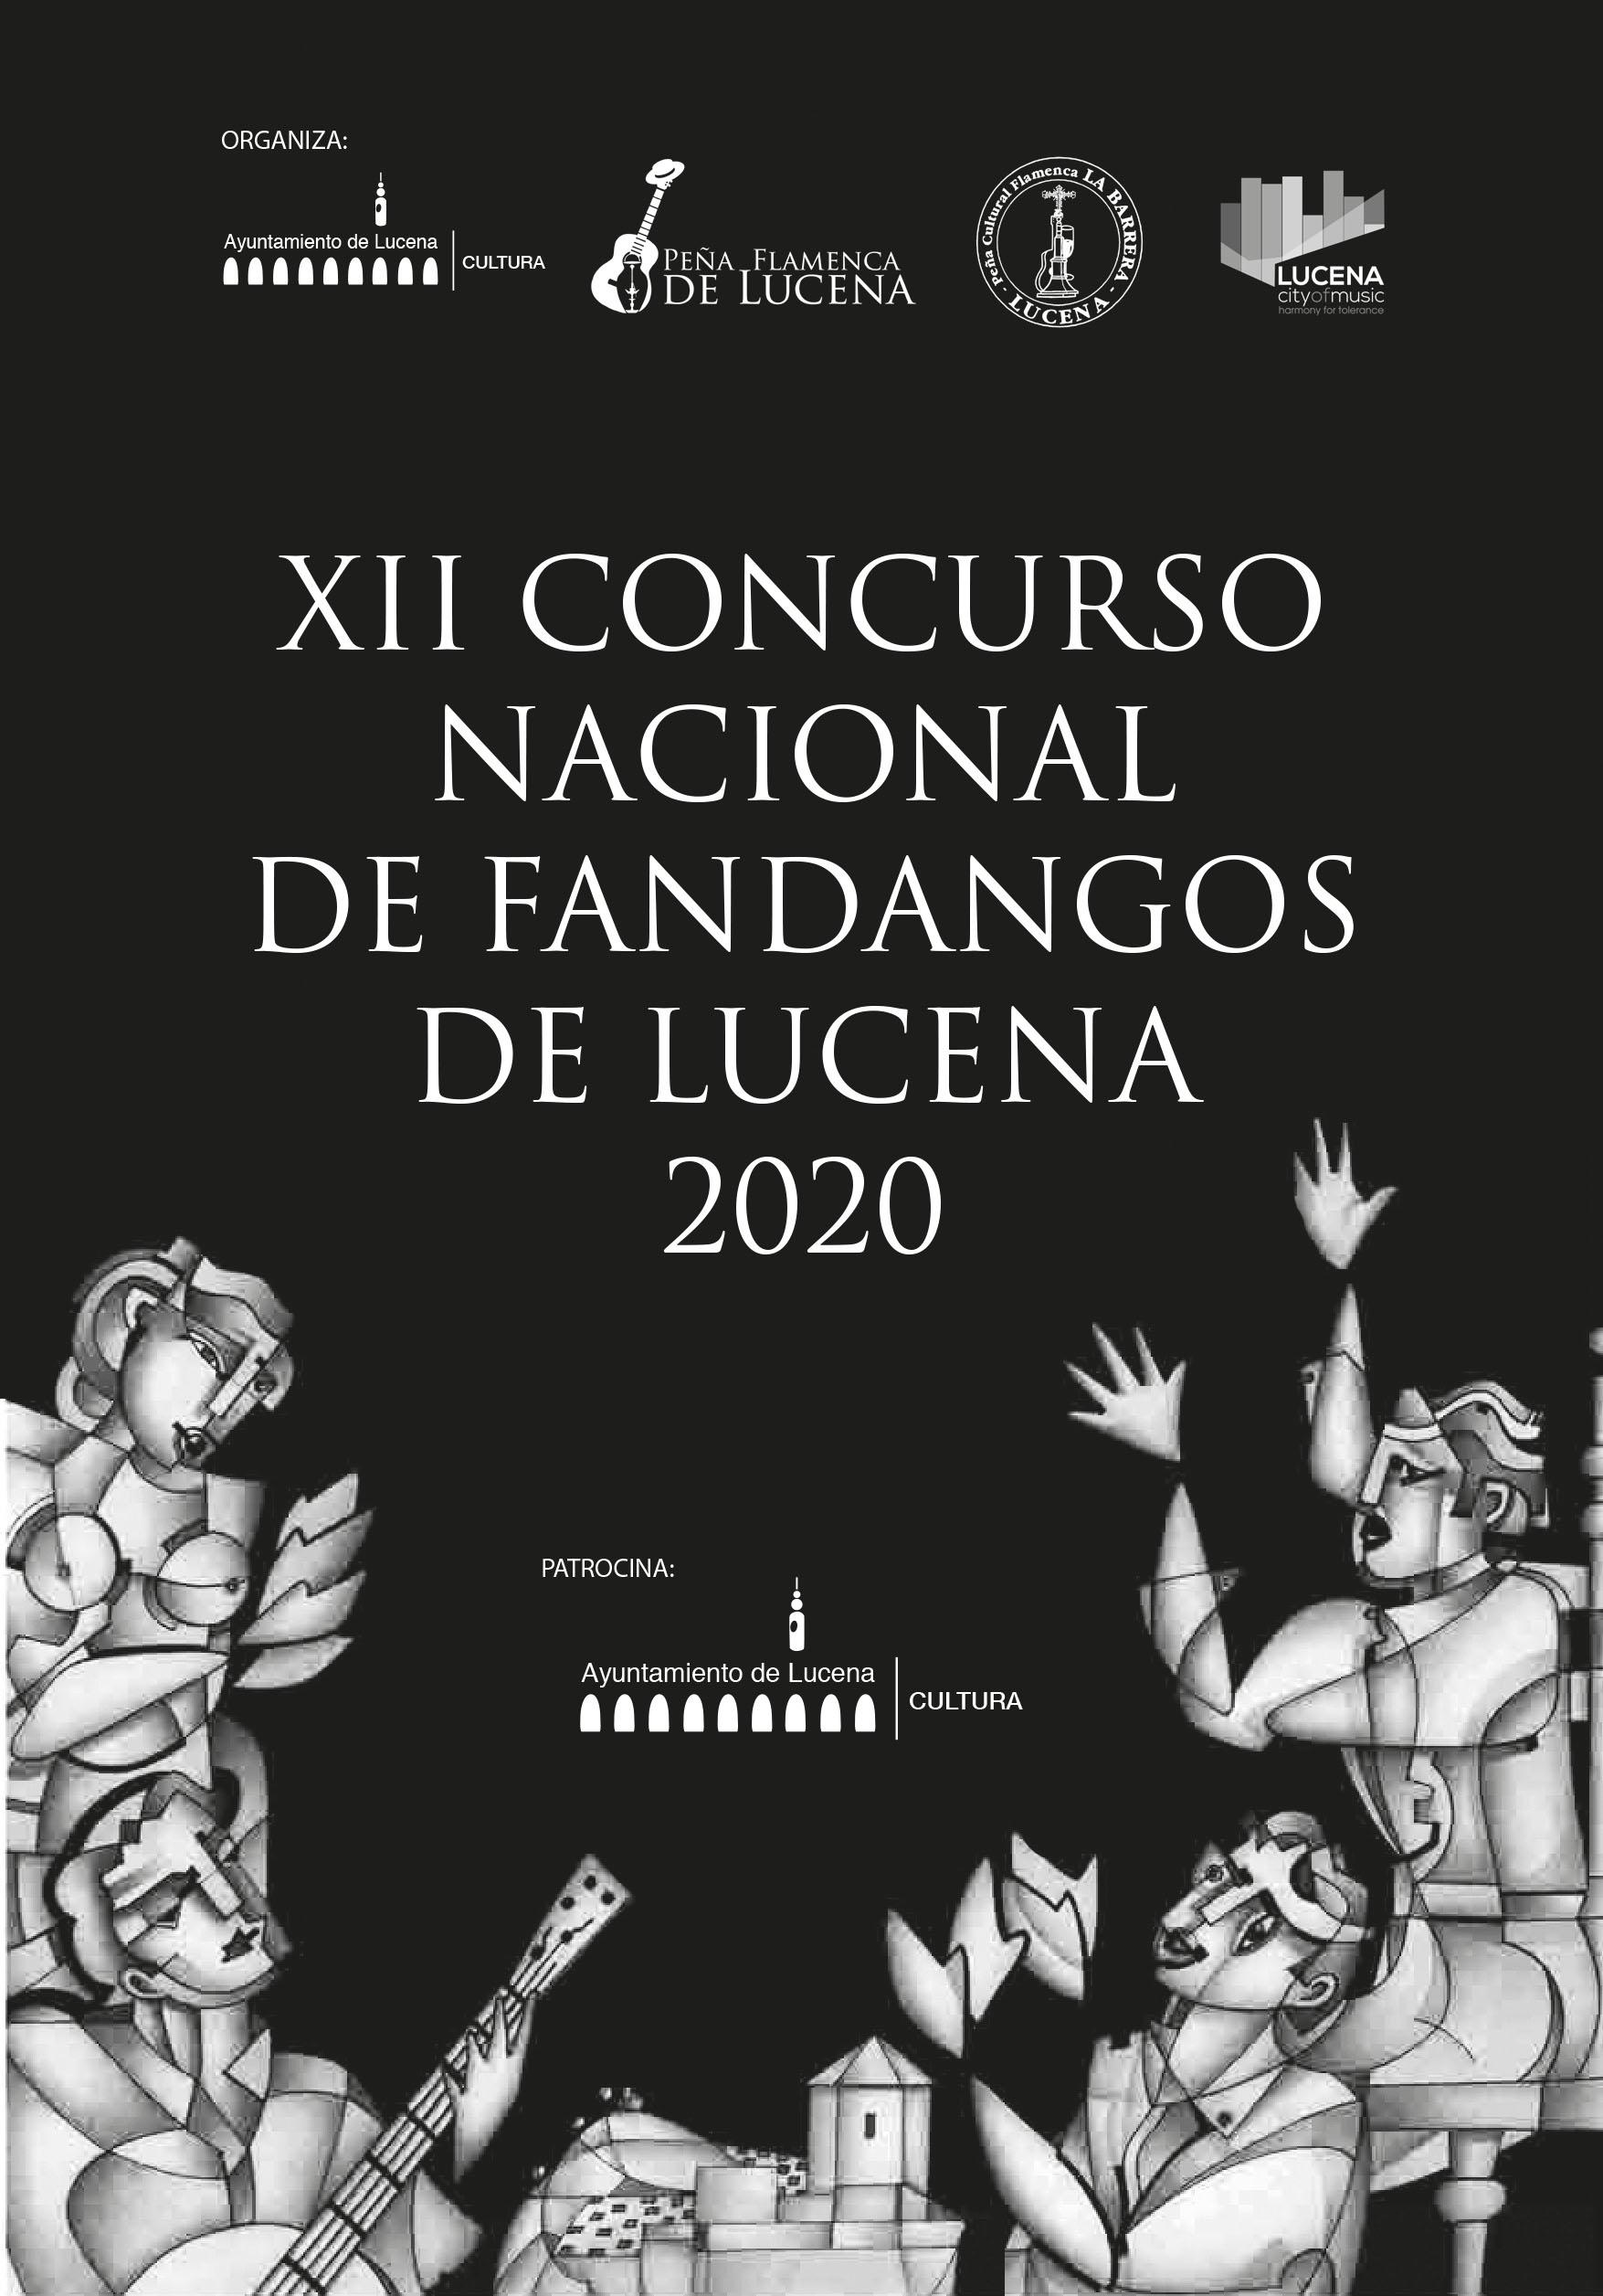 XII CONCURSO NACIONAL DE FANDANGOS DE LUCENA @ Delegación de Cultura